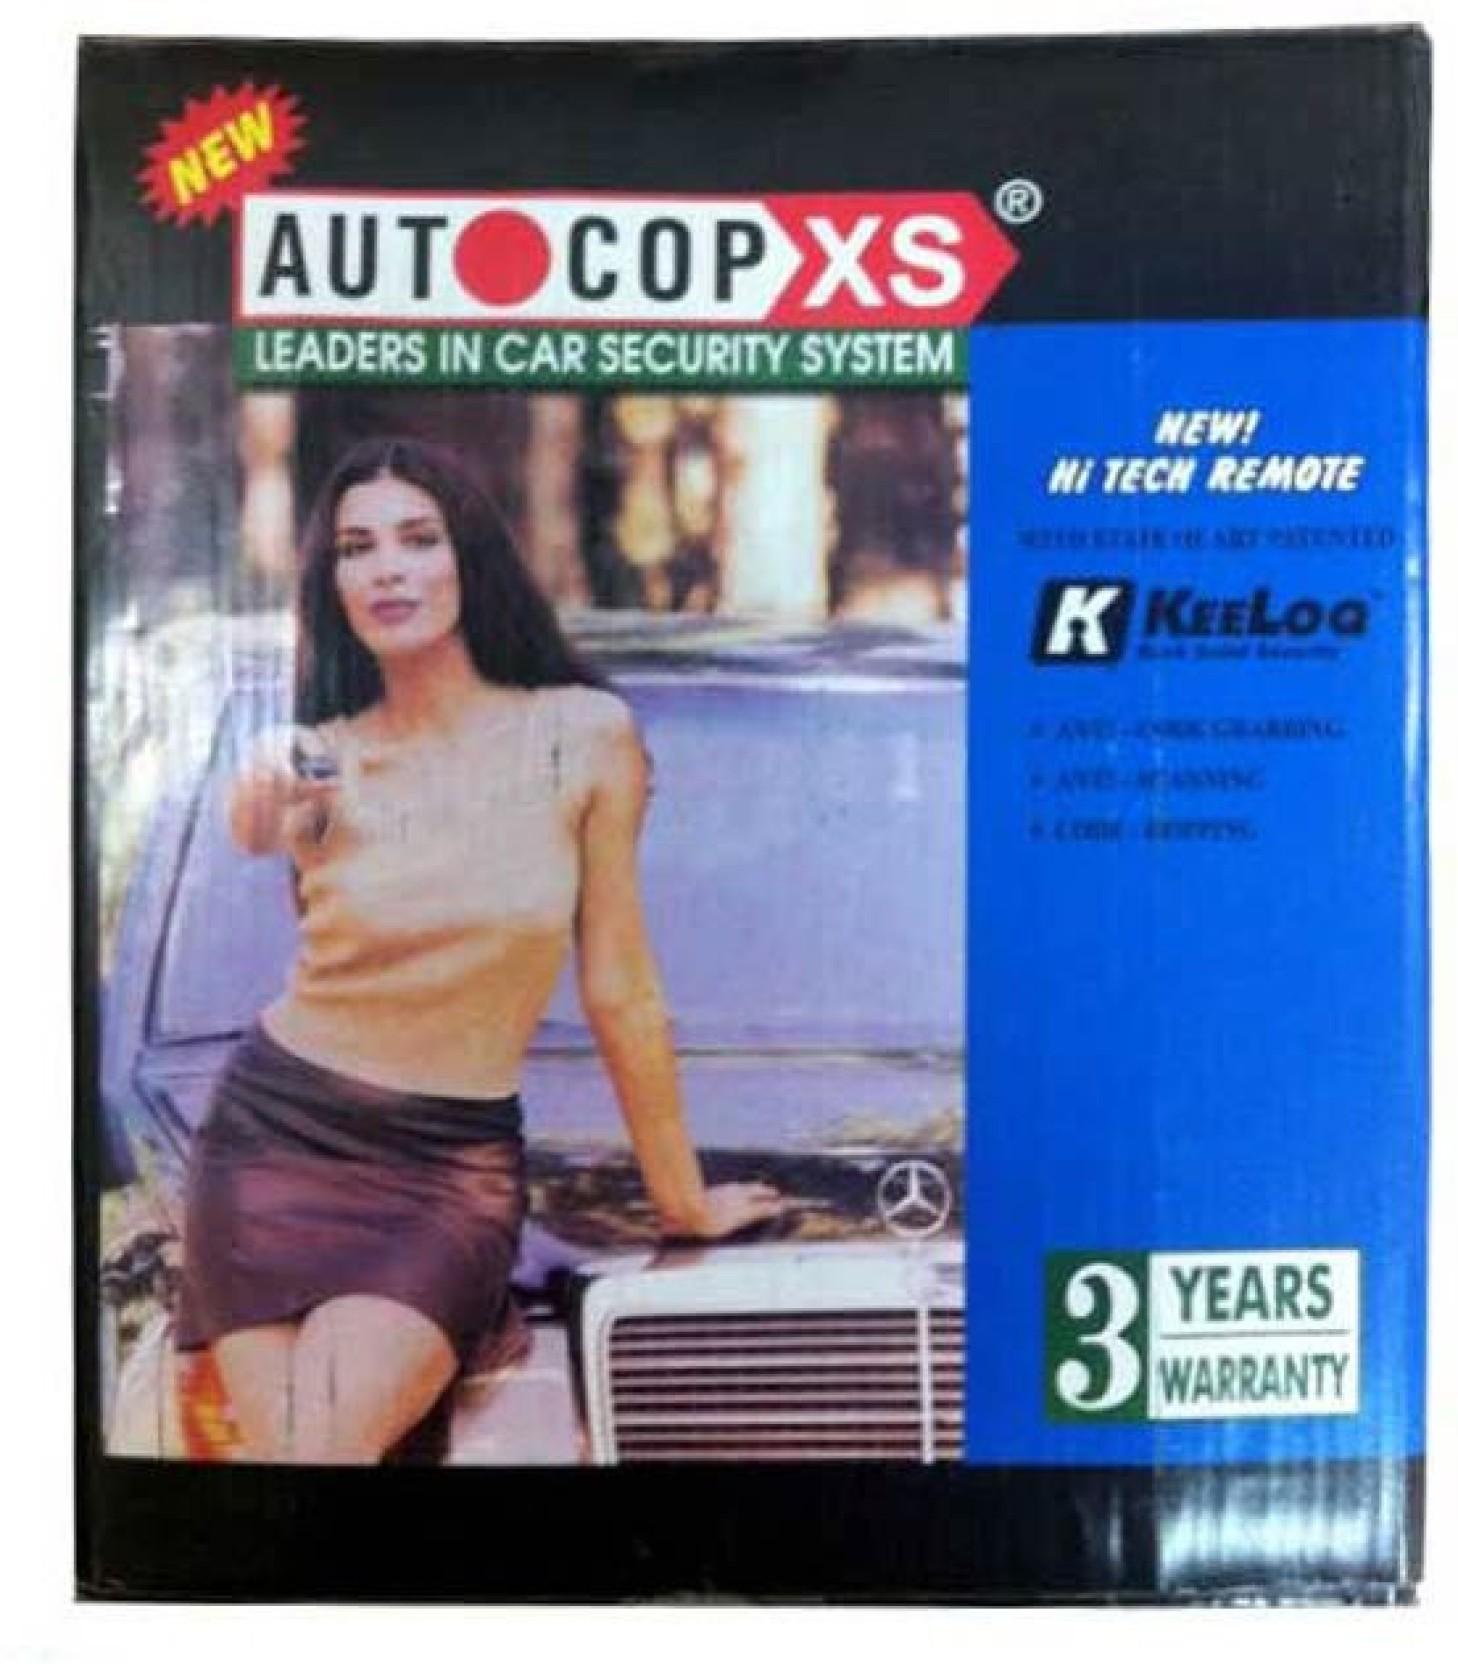 Autocop Car Security System Reviews